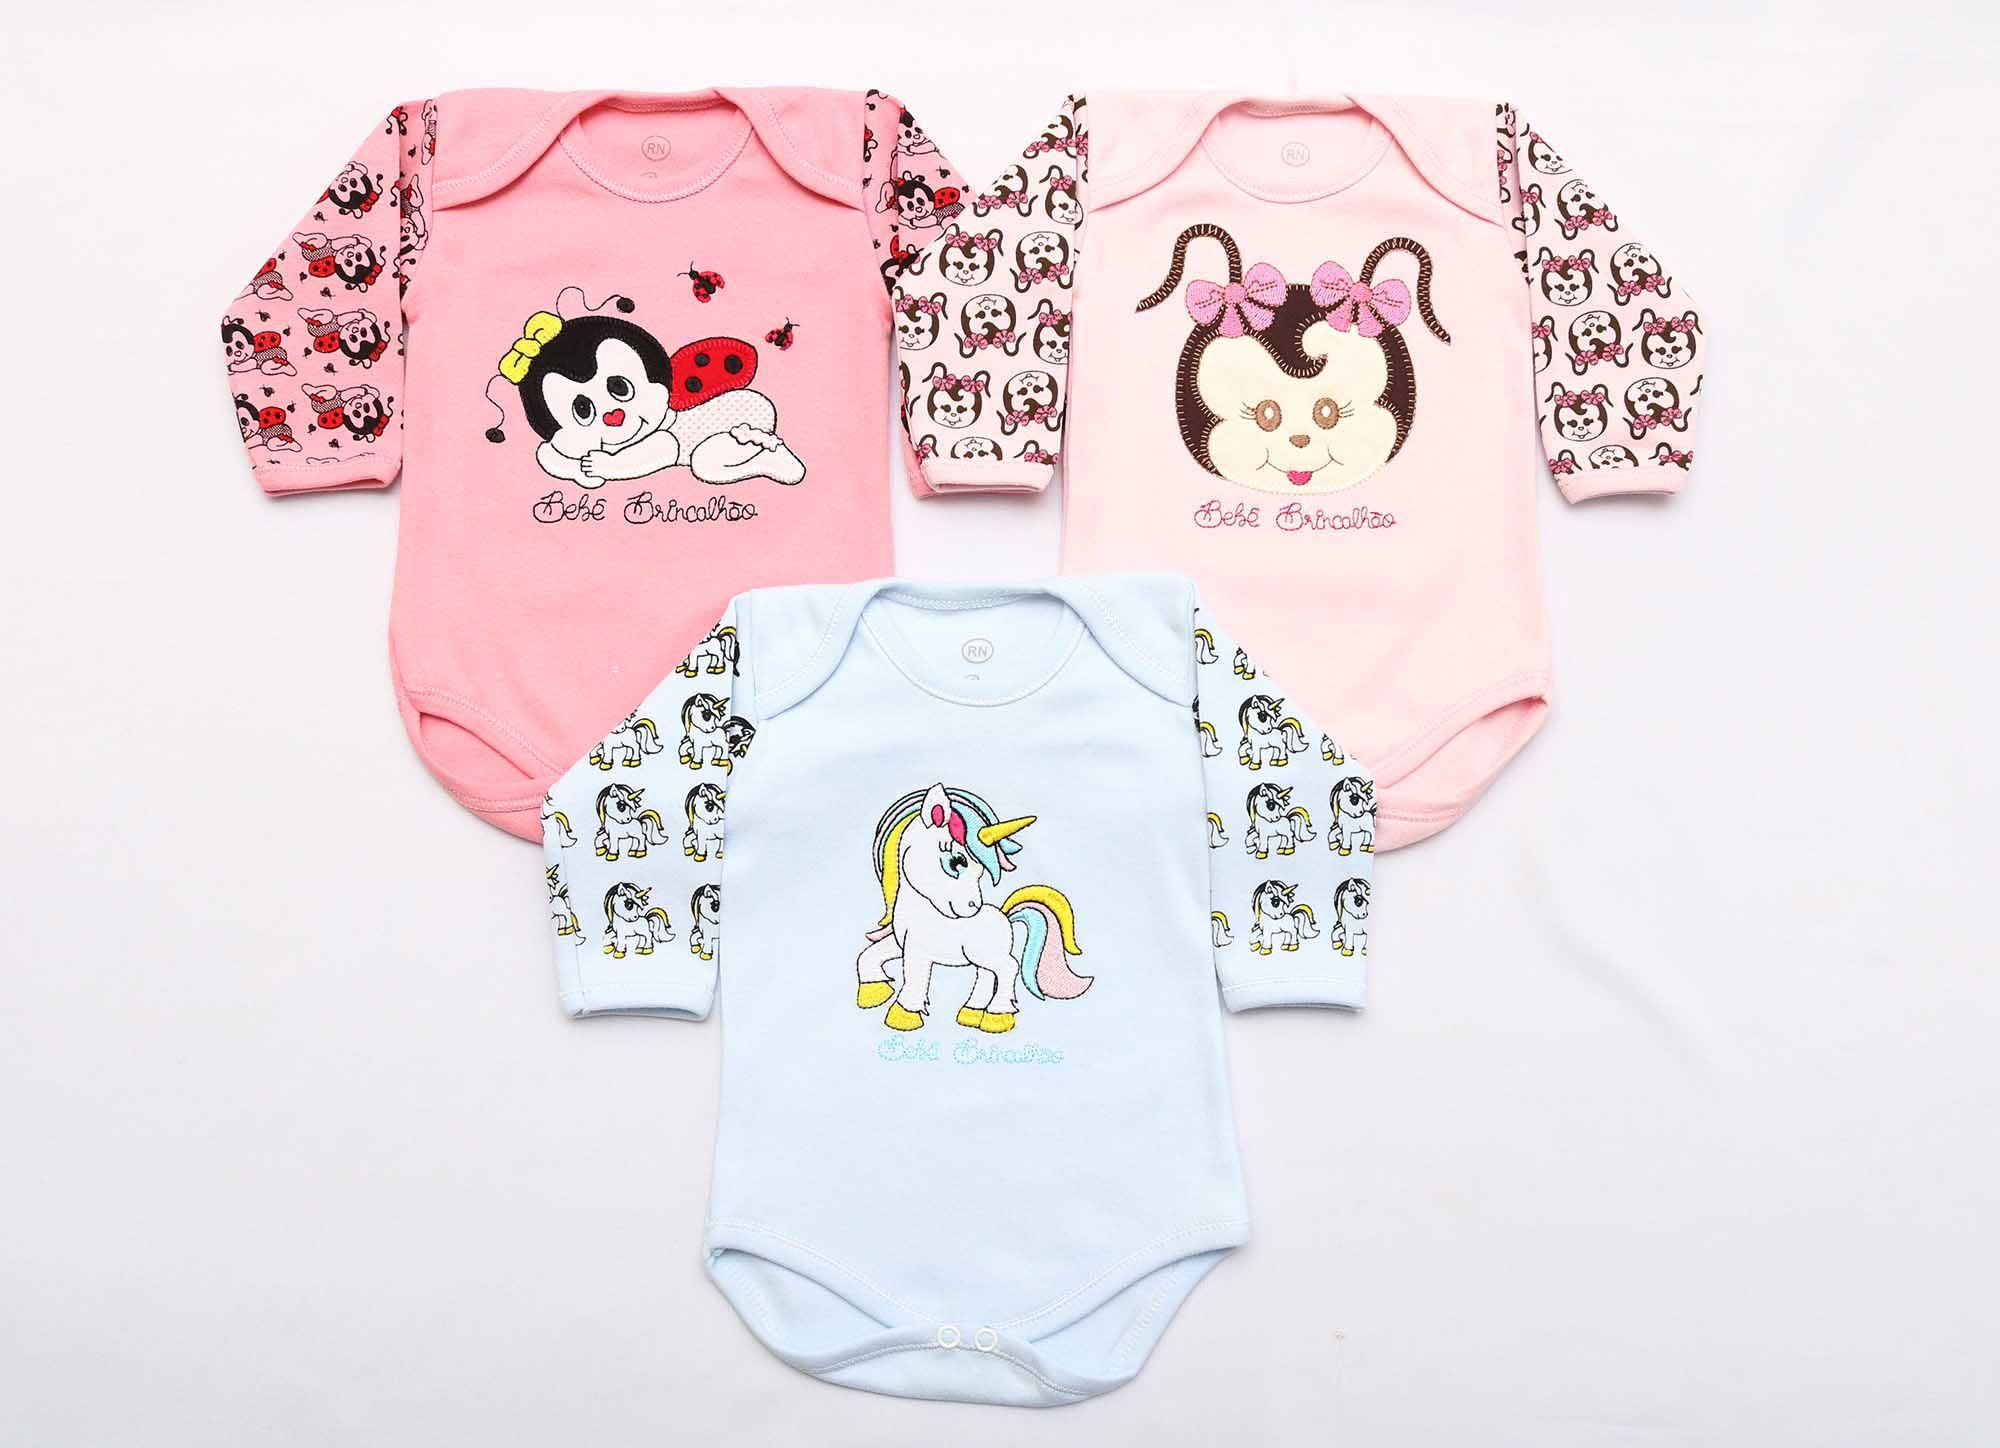 Kit Body Bebê 3 Peças Menina Rosa Bordado Joaninha